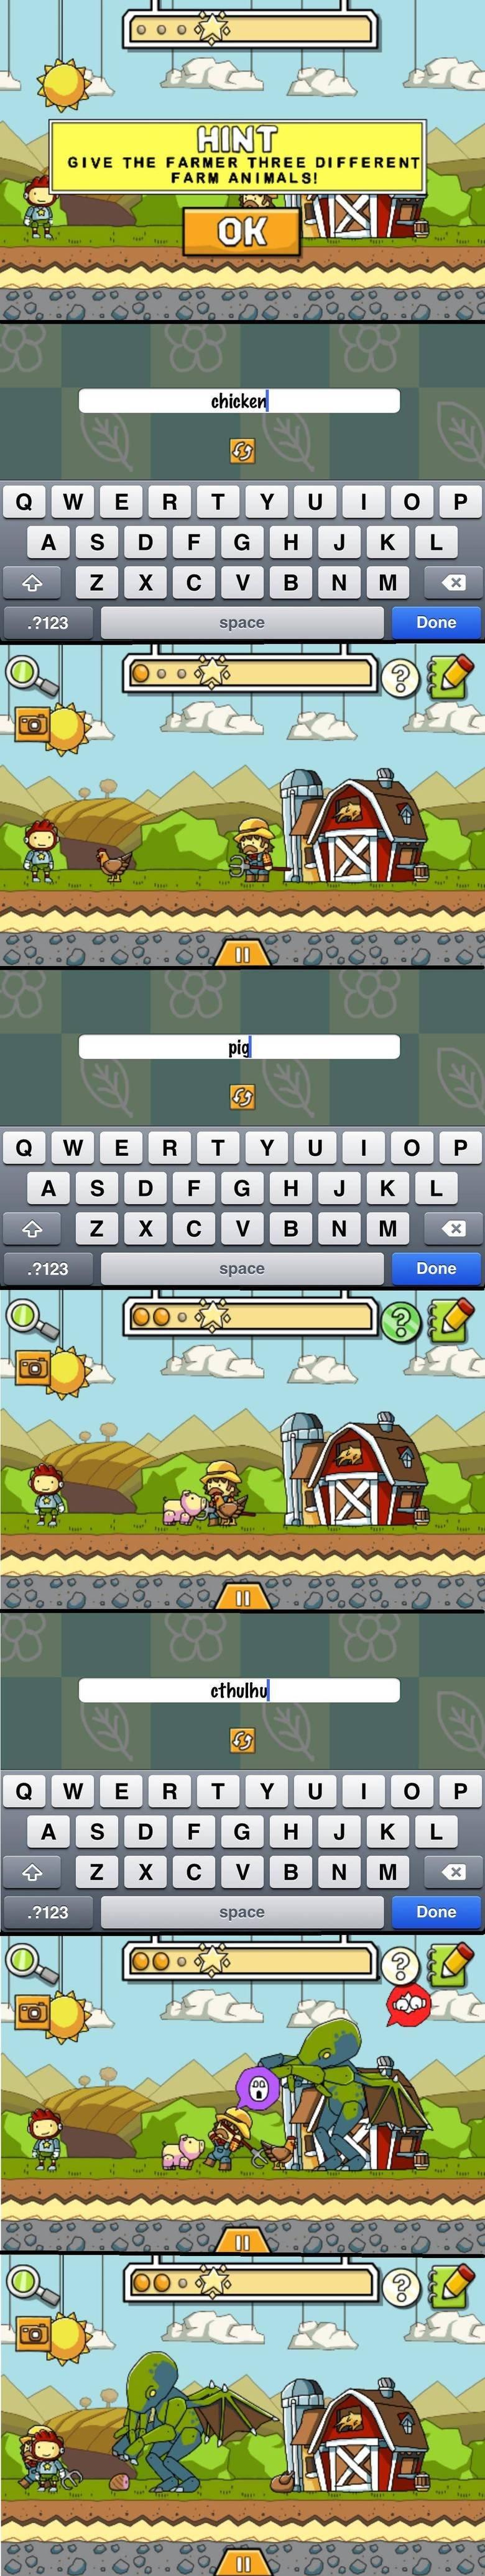 Scribblenauts. . GIVE THE FARMER THREE DIFFERENT FARR ananananon 123 Done VIE. Aww !! Mo' Scribblenauts!!